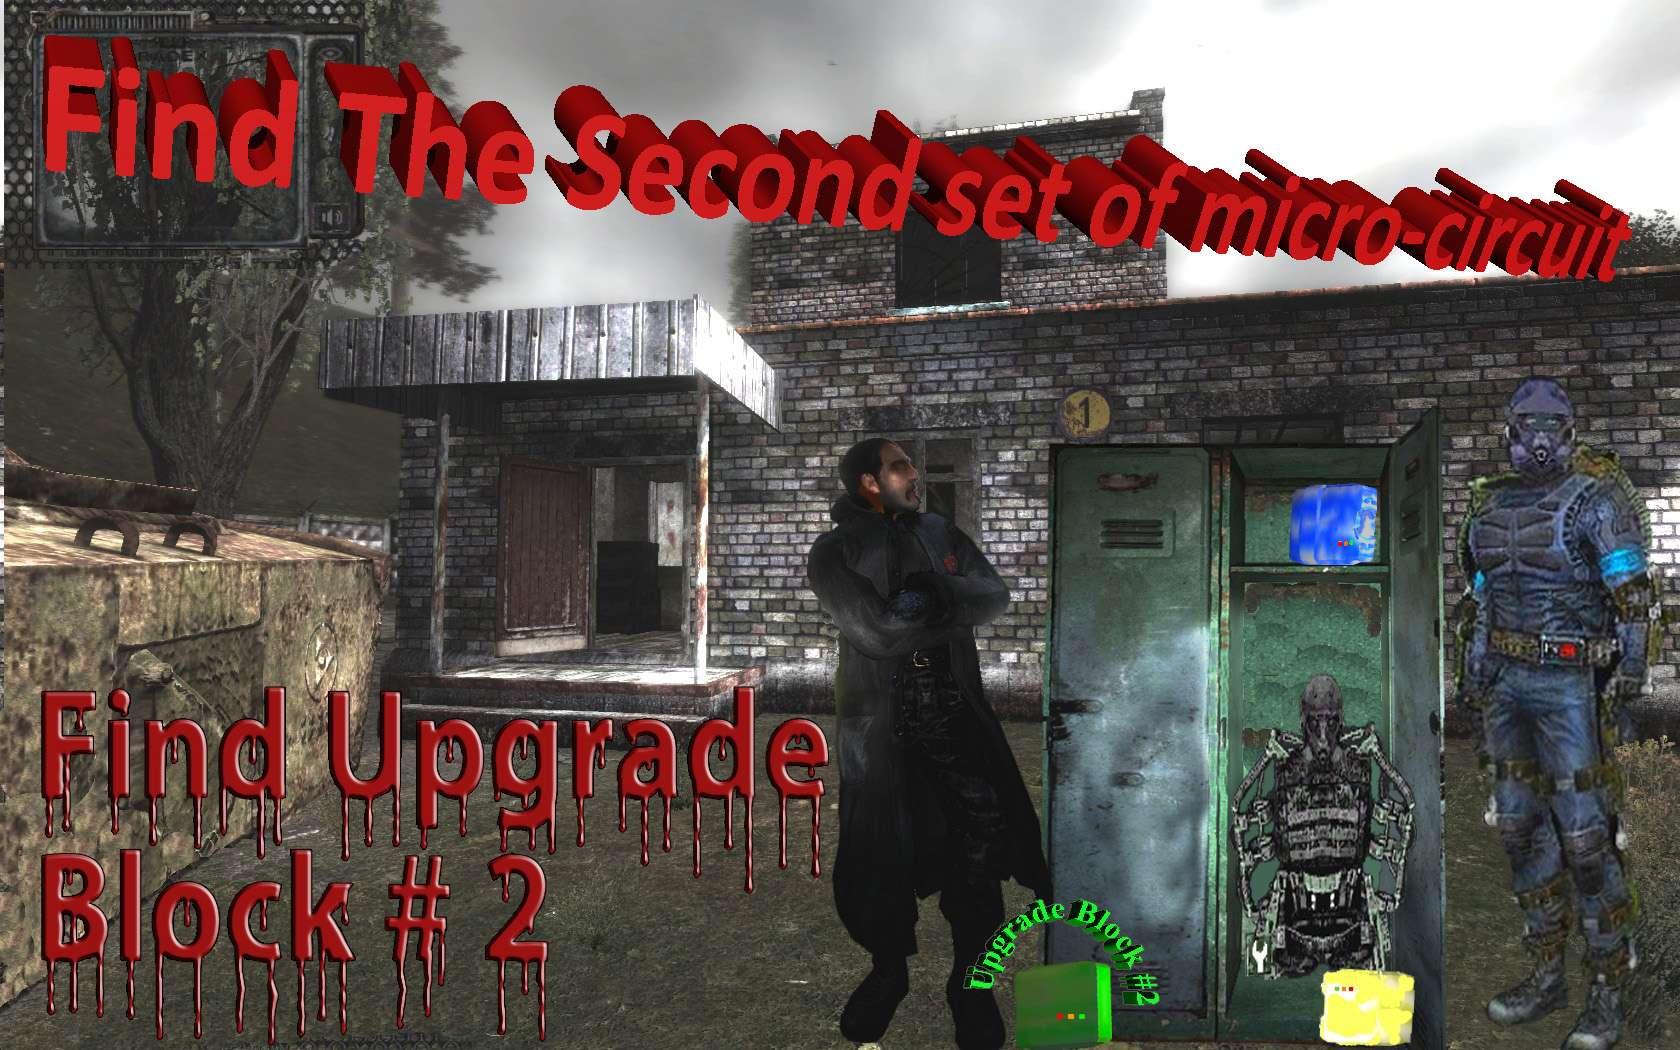 Find Upgrade Block #2   EN SCREEN = en Image  A10